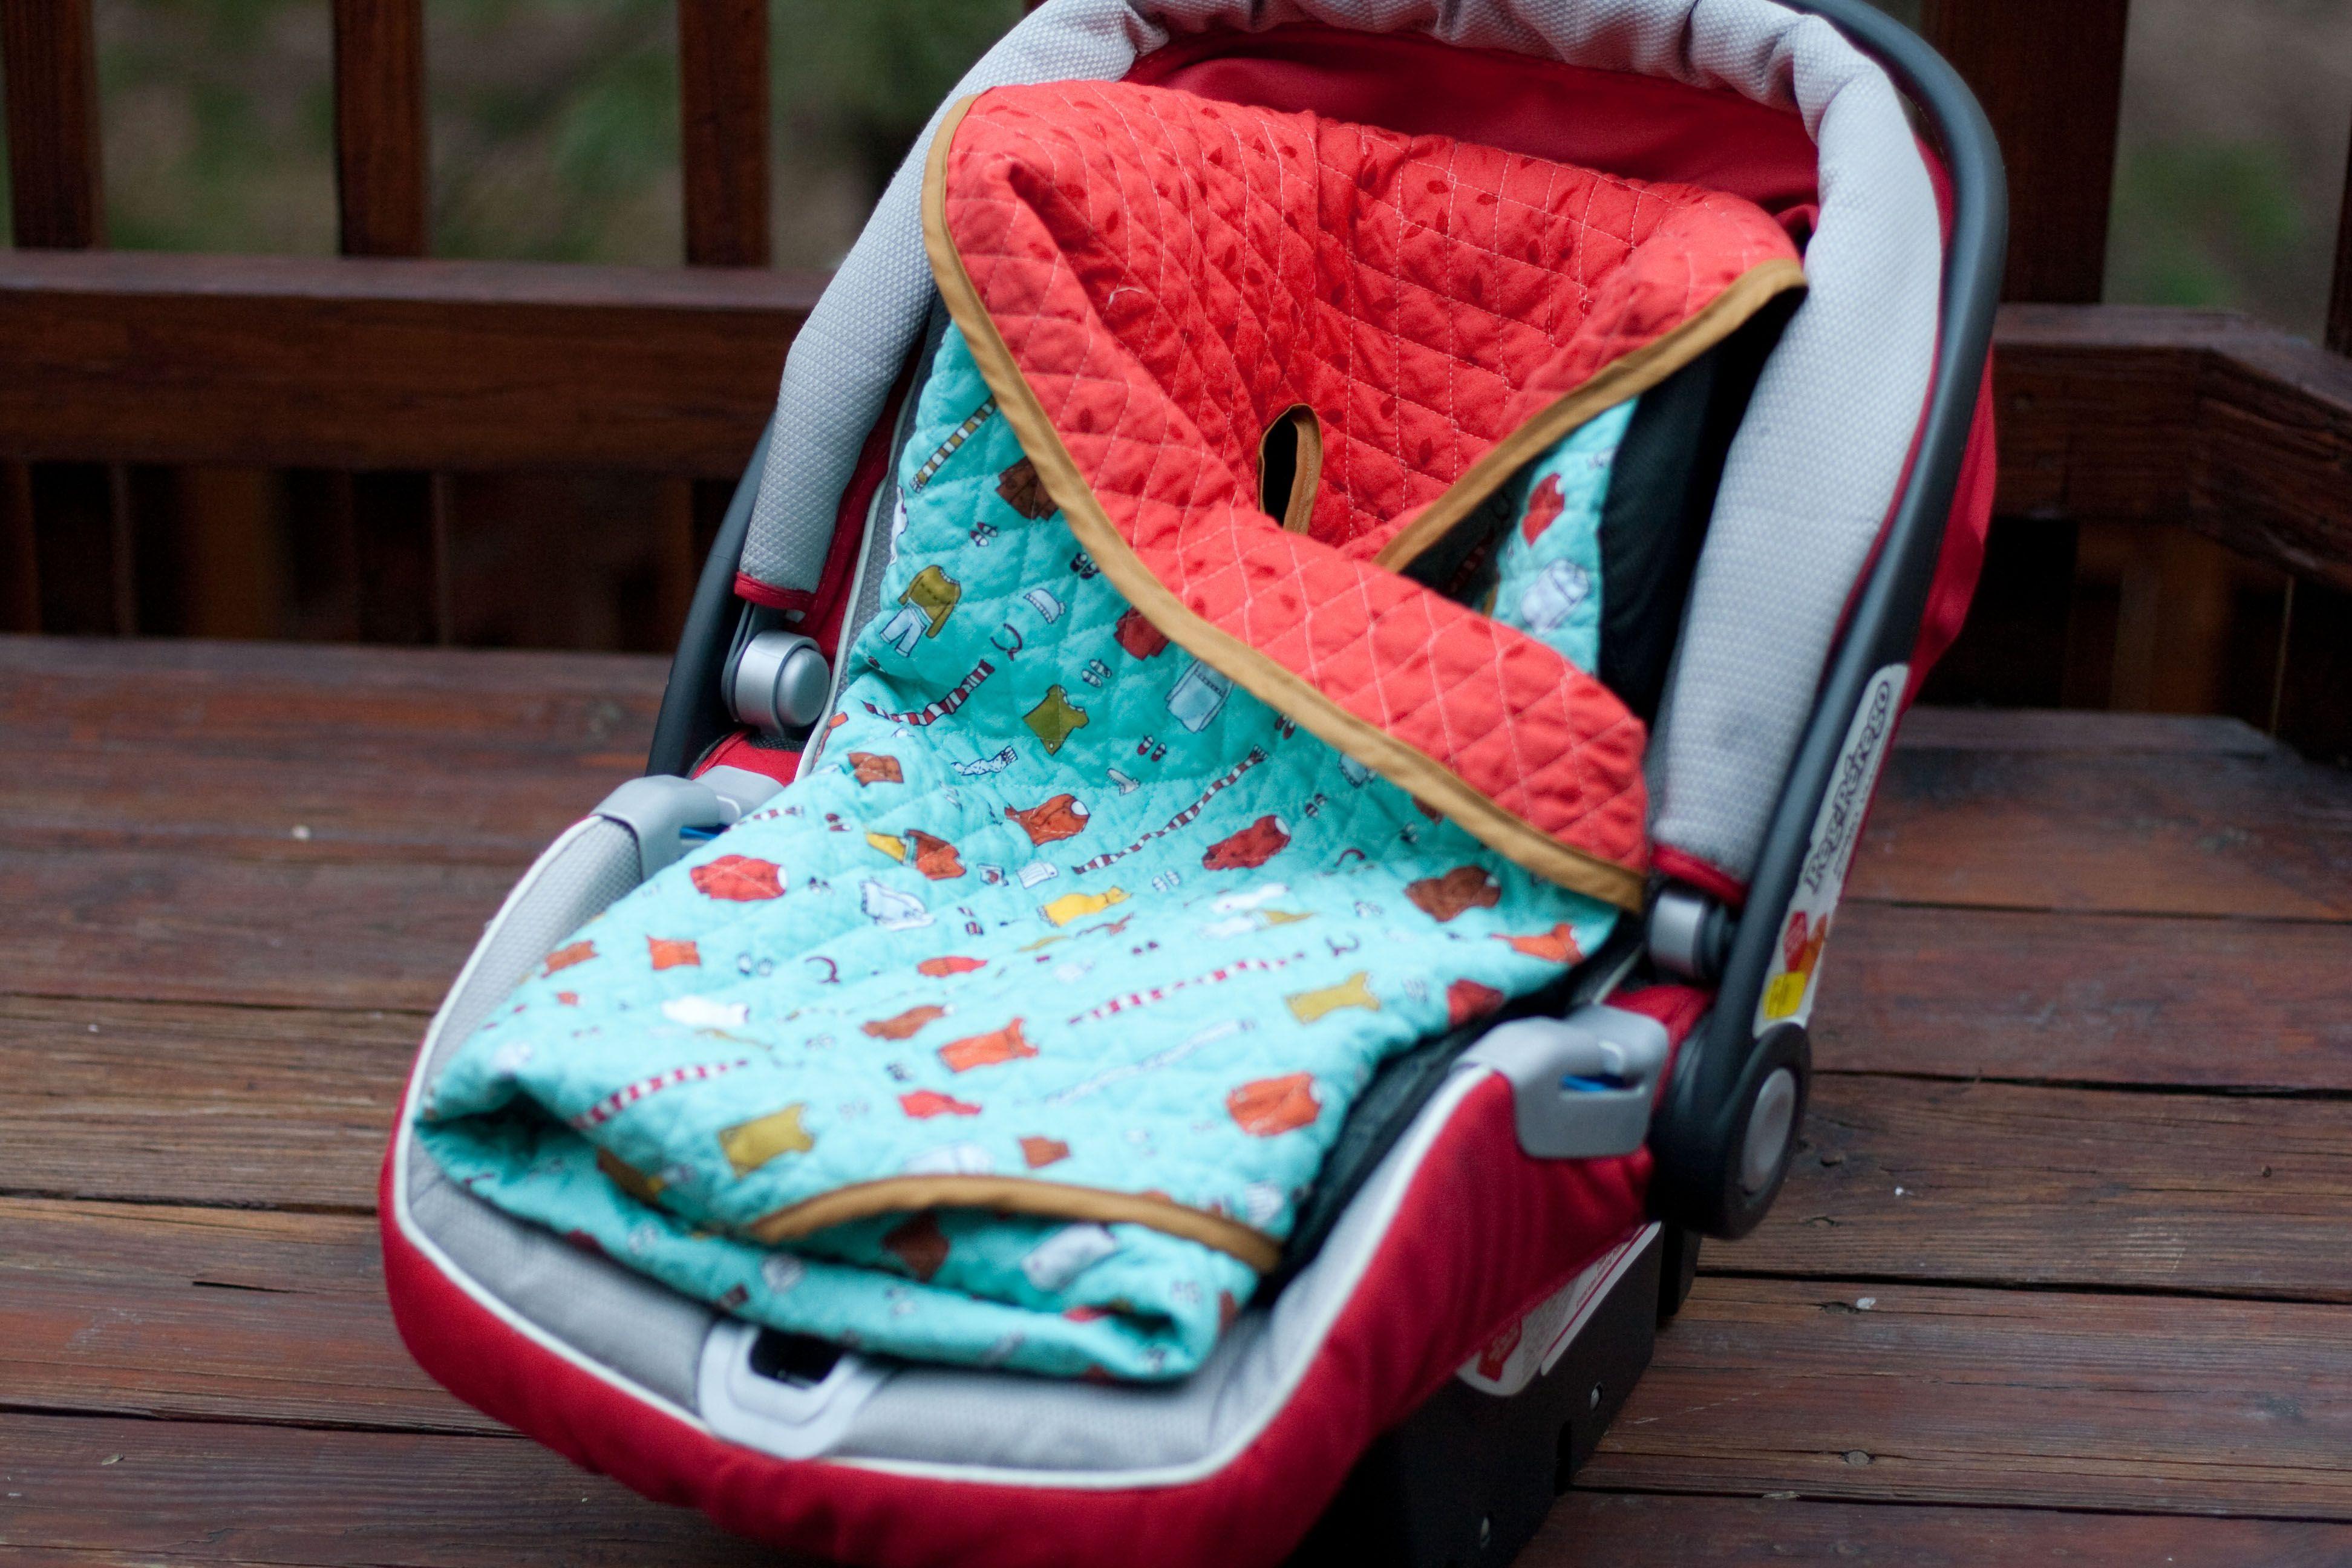 car seat blankets | Sewing | Pinterest | Car seat blanket, Car seats